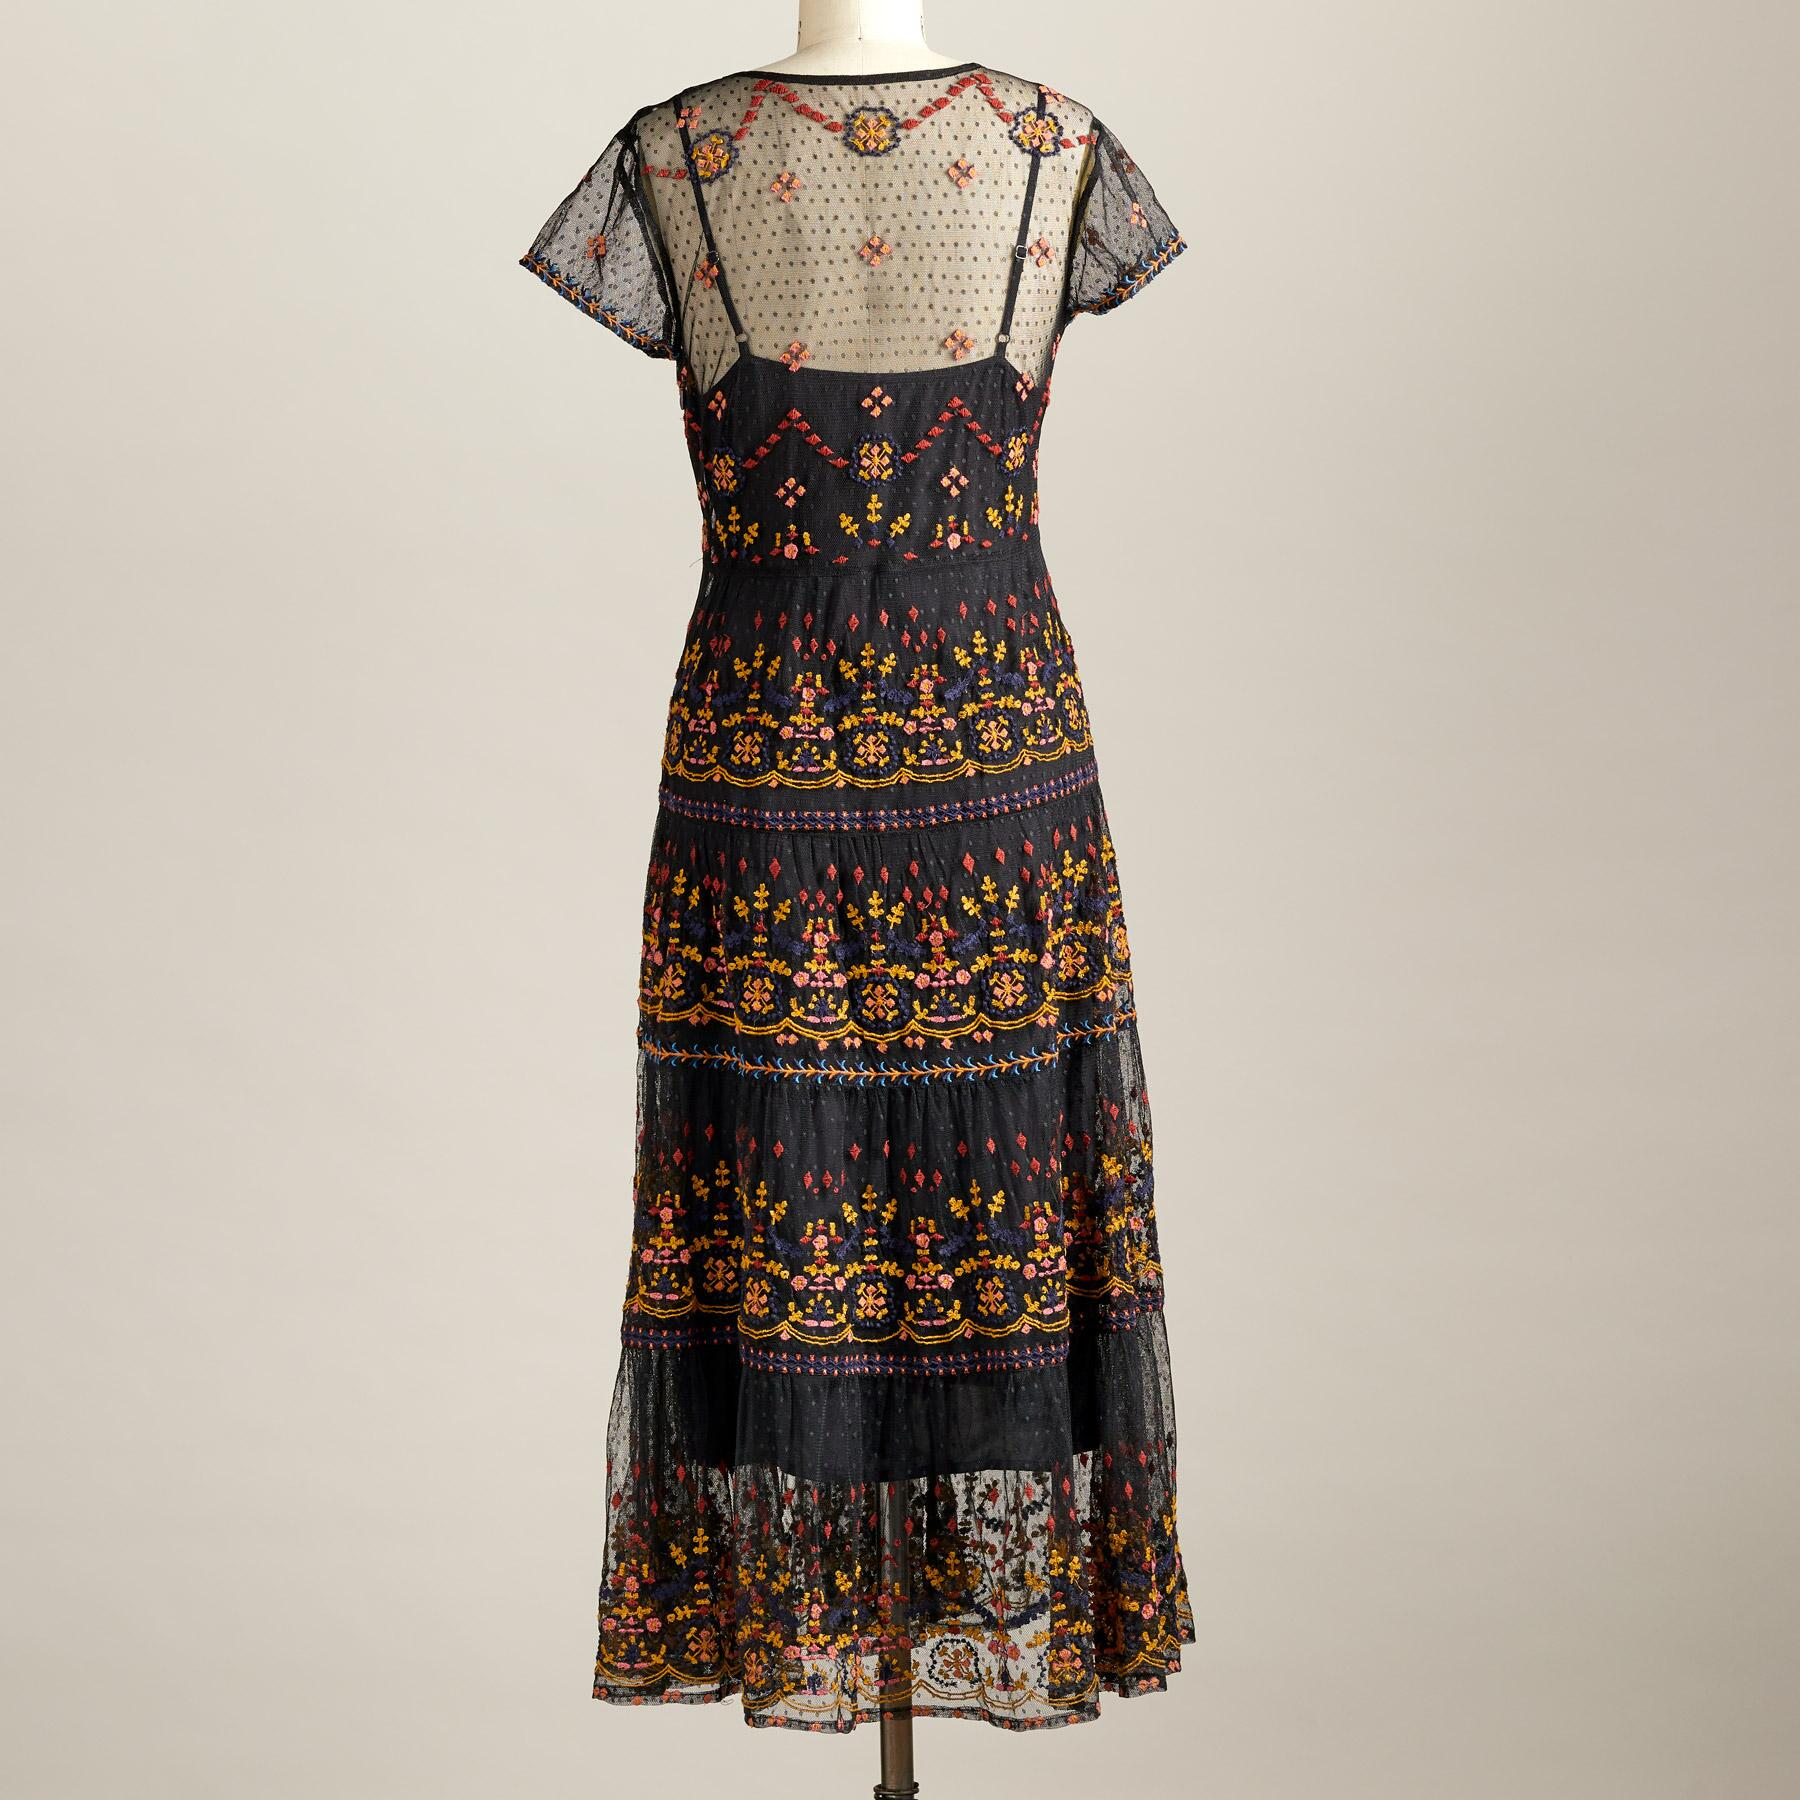 NEW MOON DRESS - PETITES: View 2